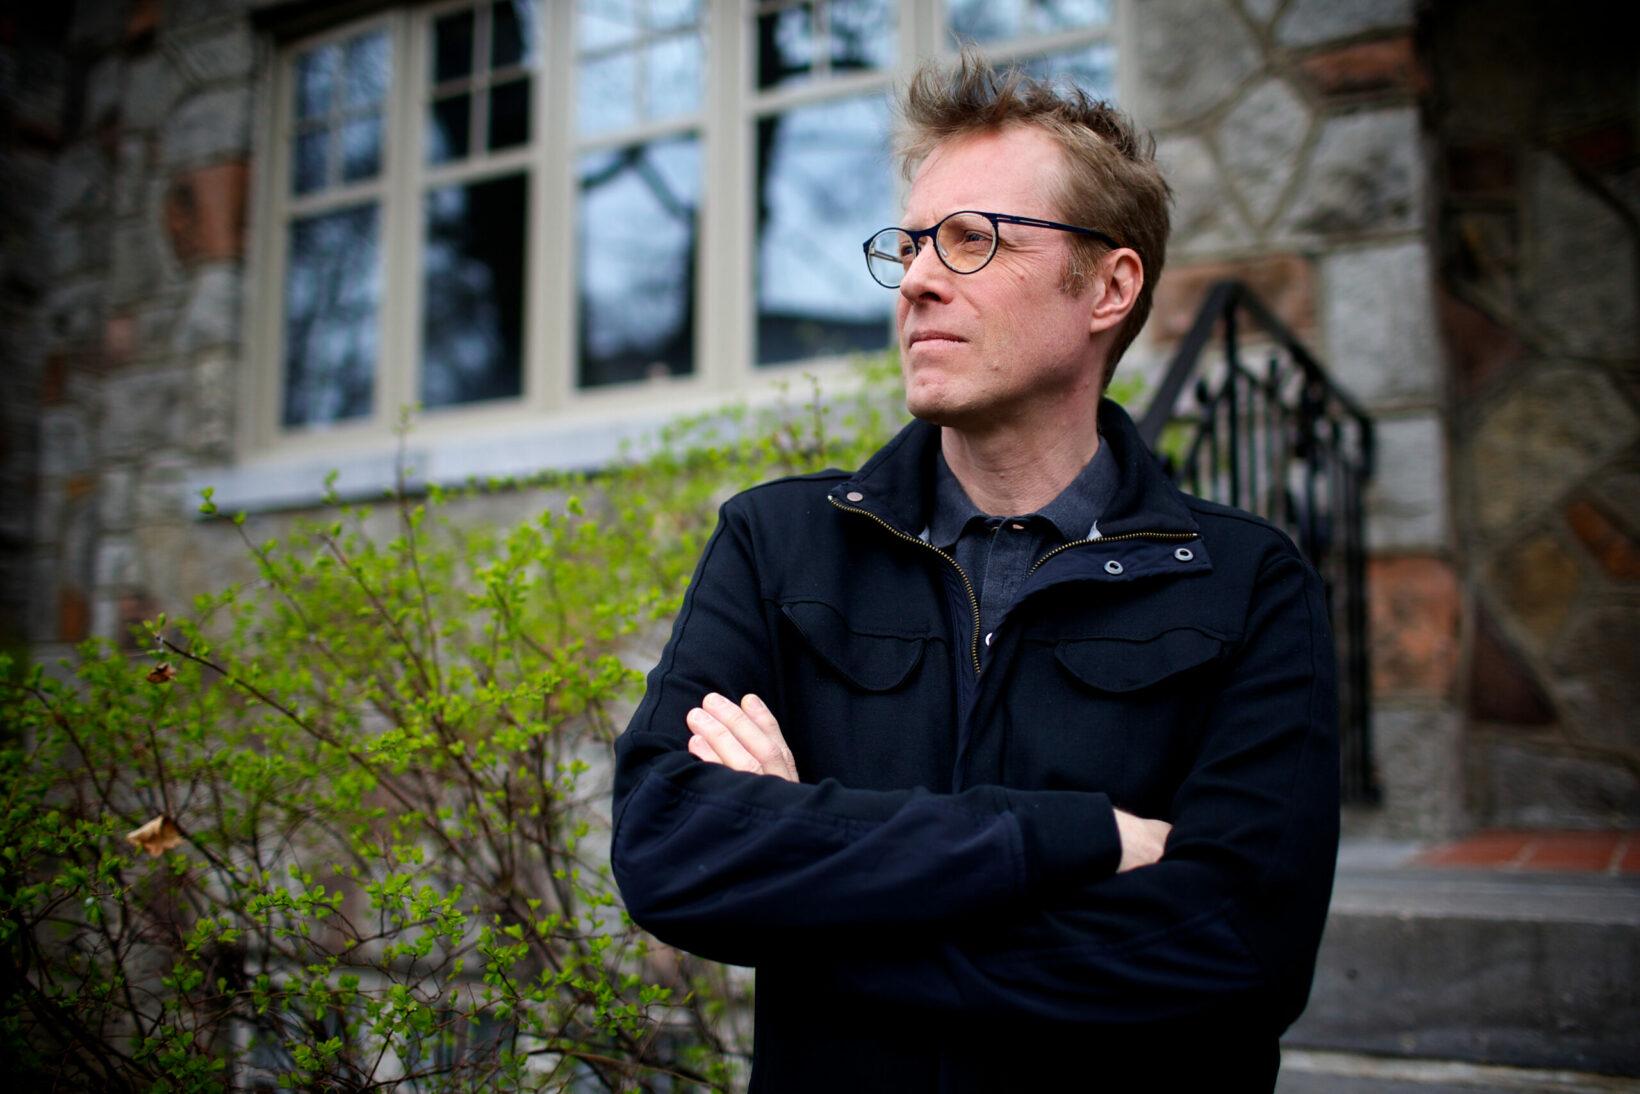 Associate professor of psychiatry Alain Brunet (Photo: Sarah Mongeau-Birkett)